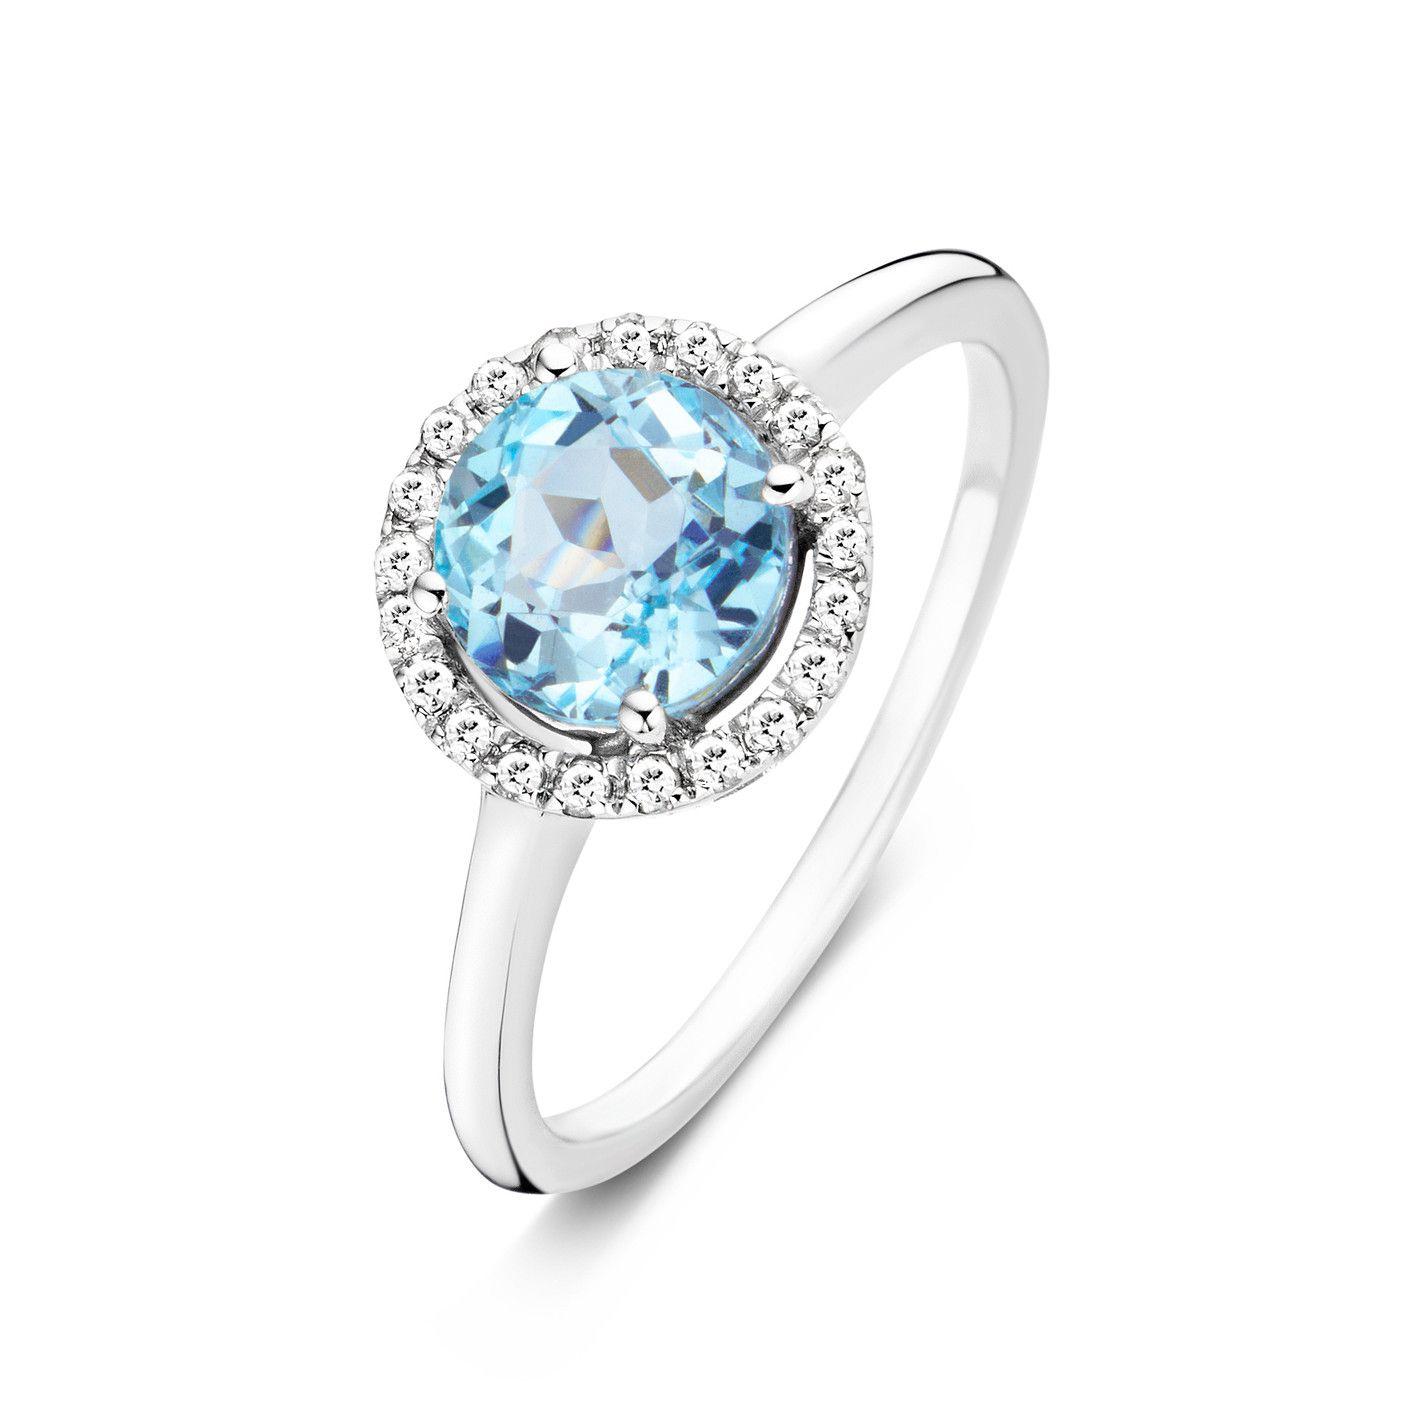 Tutti Colori Ring Blue Topaz - Ringen - Juwelen - Diamanti Per Tutti